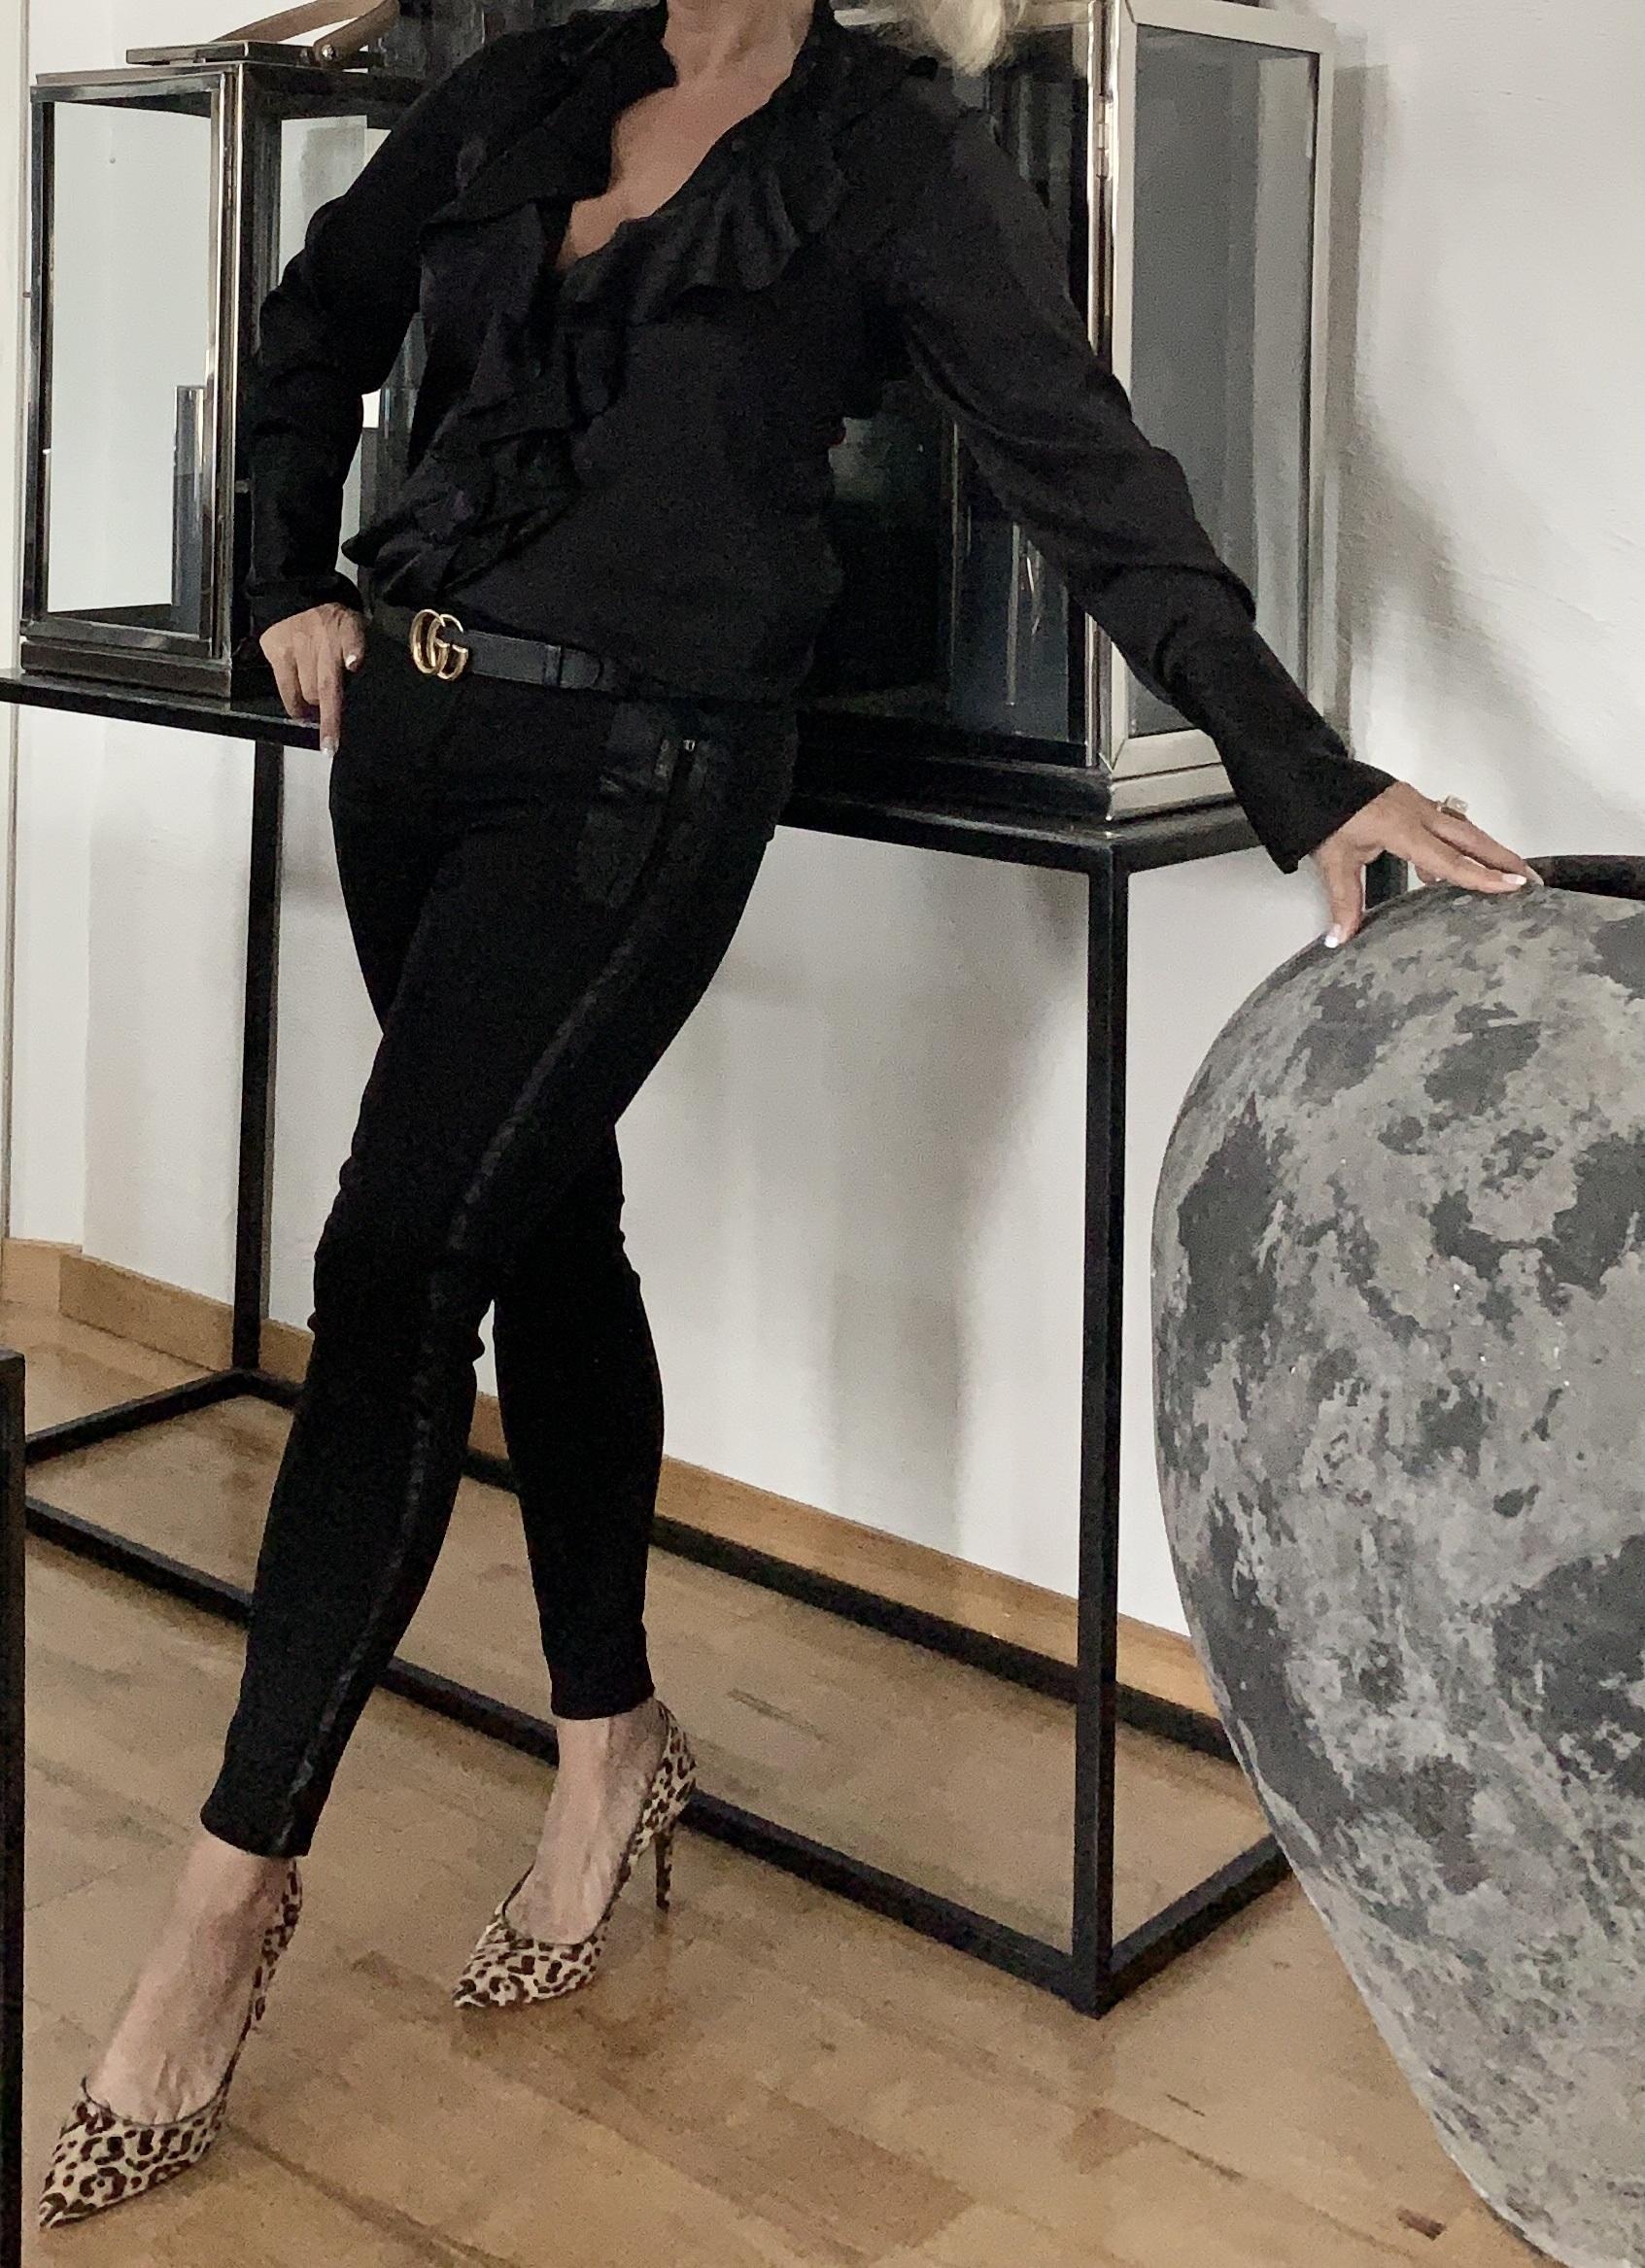 NÜ DENMARK Raix Eli Trousers IMAGE BY ME